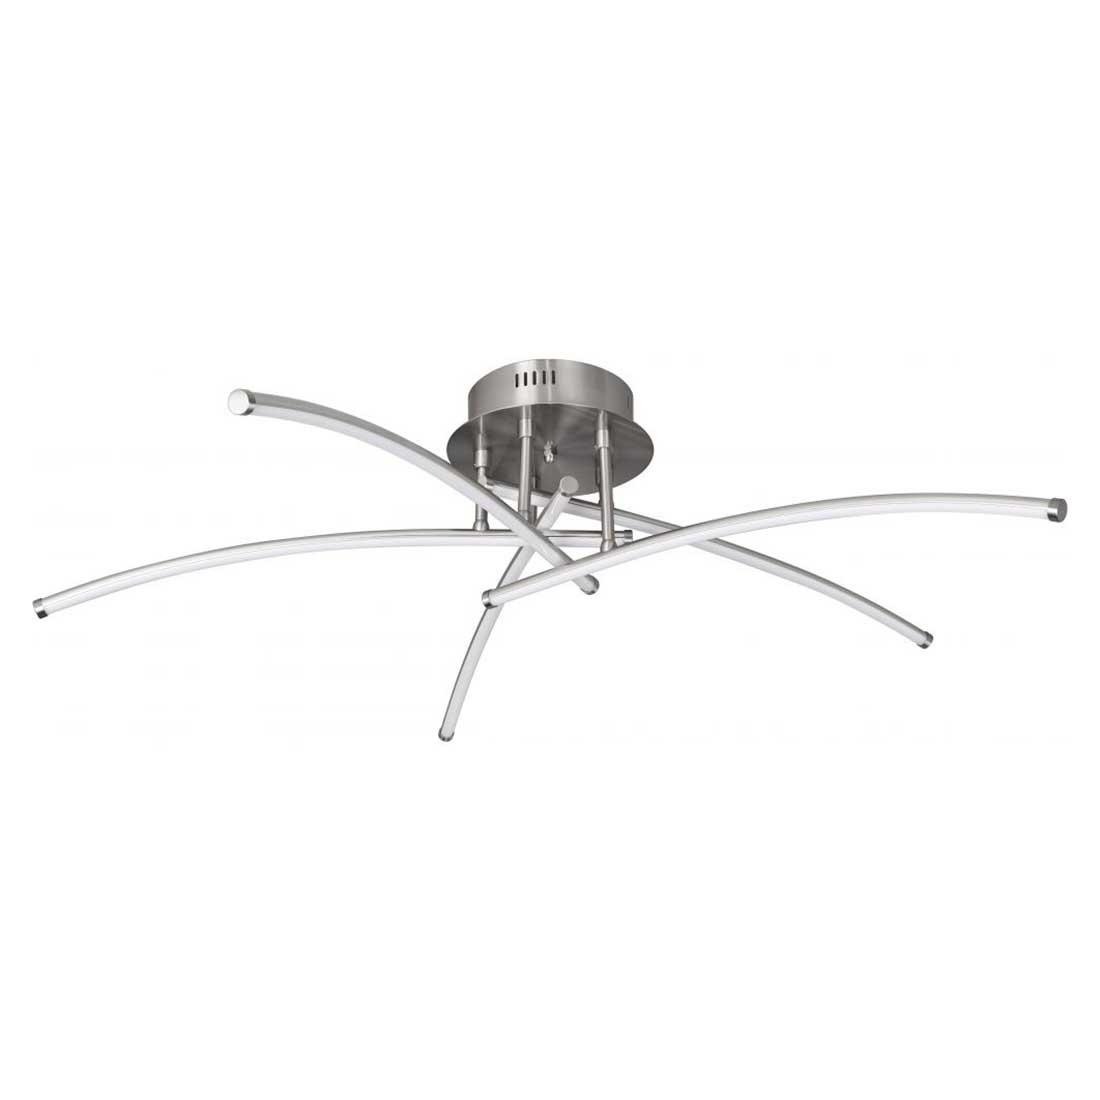 Highlight Plafondlamp Proud Ø 95 cm 36 Watt mat chroom